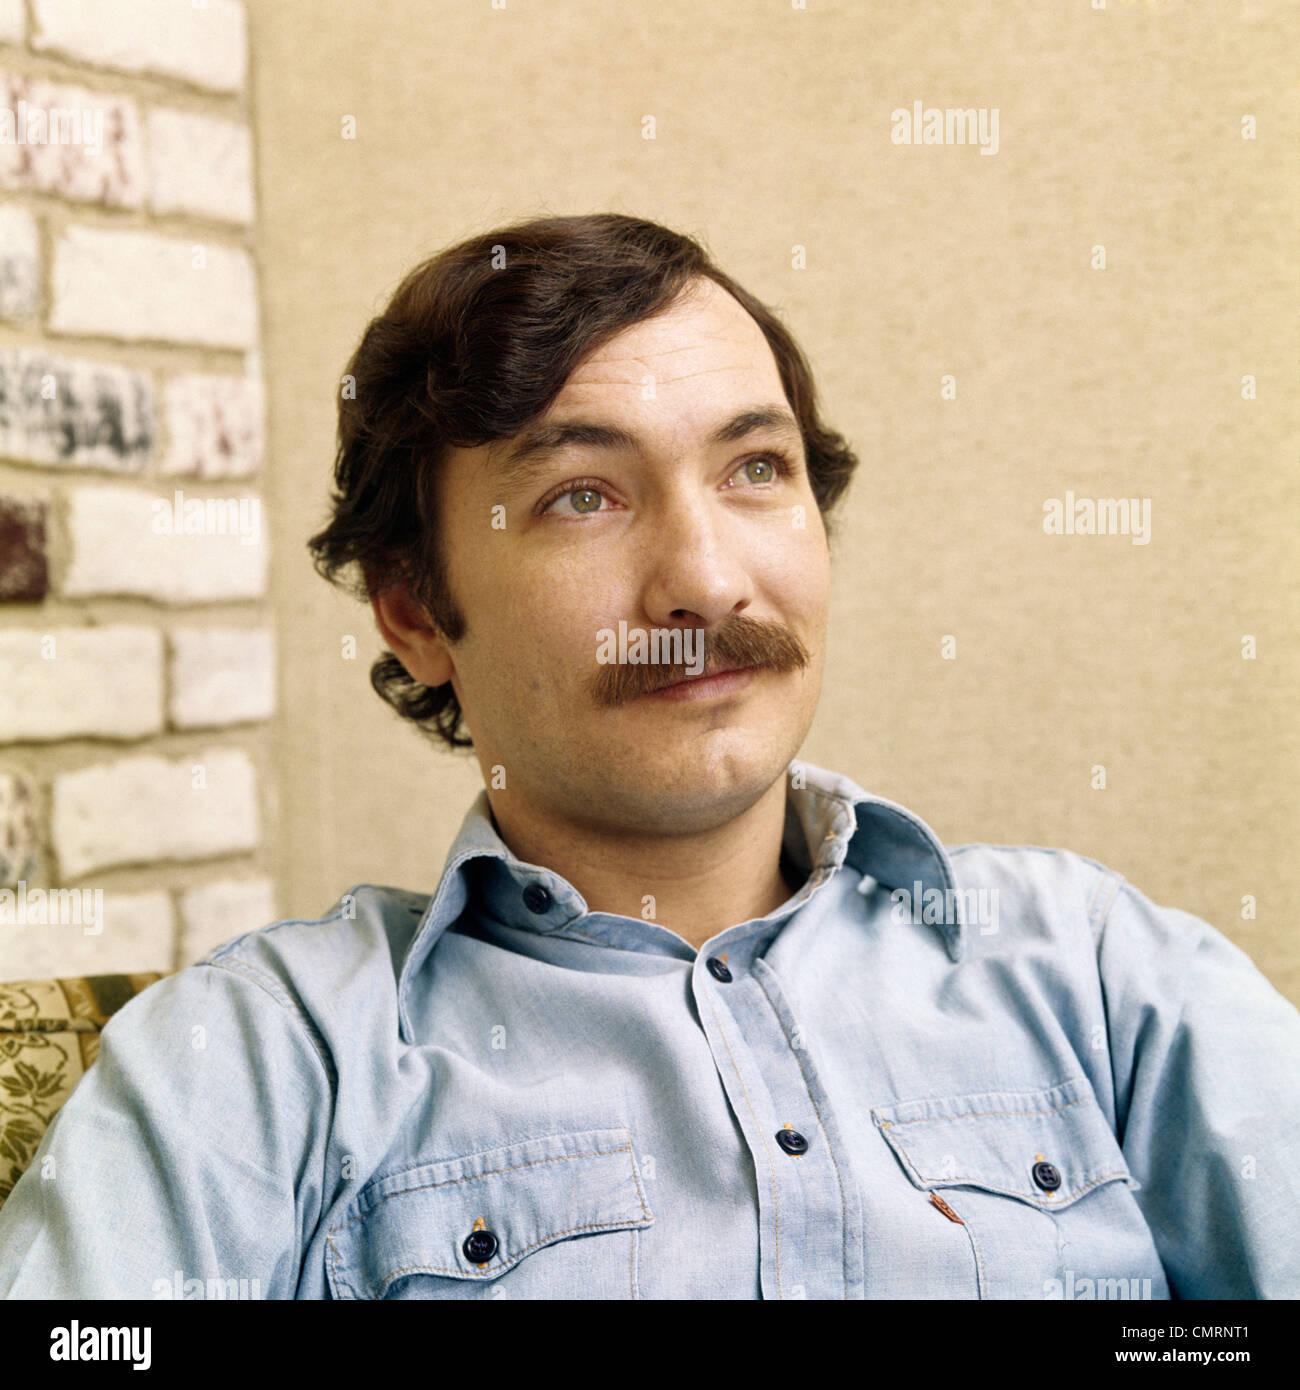 1970 1970s RETRO PORTRAIT MAN WITH BROWN HAIR MOUSTACHE WEARING DENIM SHIRT - Stock Image